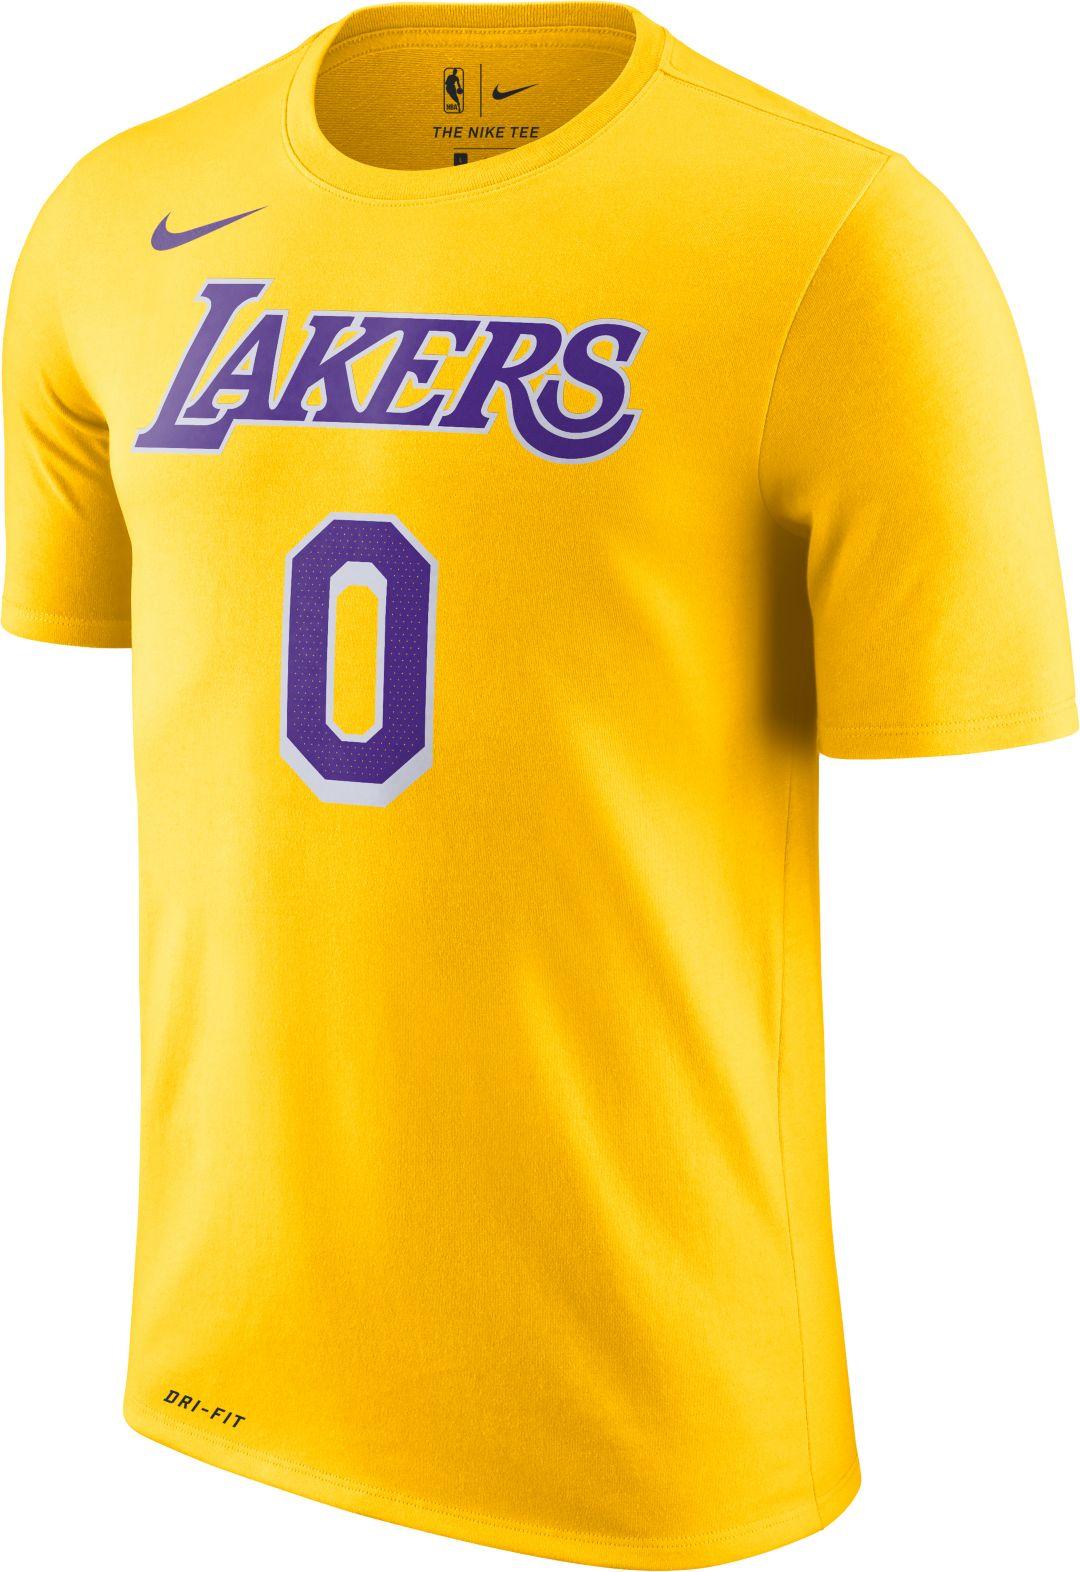 21da49c3c2ea Nike Youth Los Angeles Lakers Kyle Kuzma  0 Dri-FIT Gold T-Shirt ...